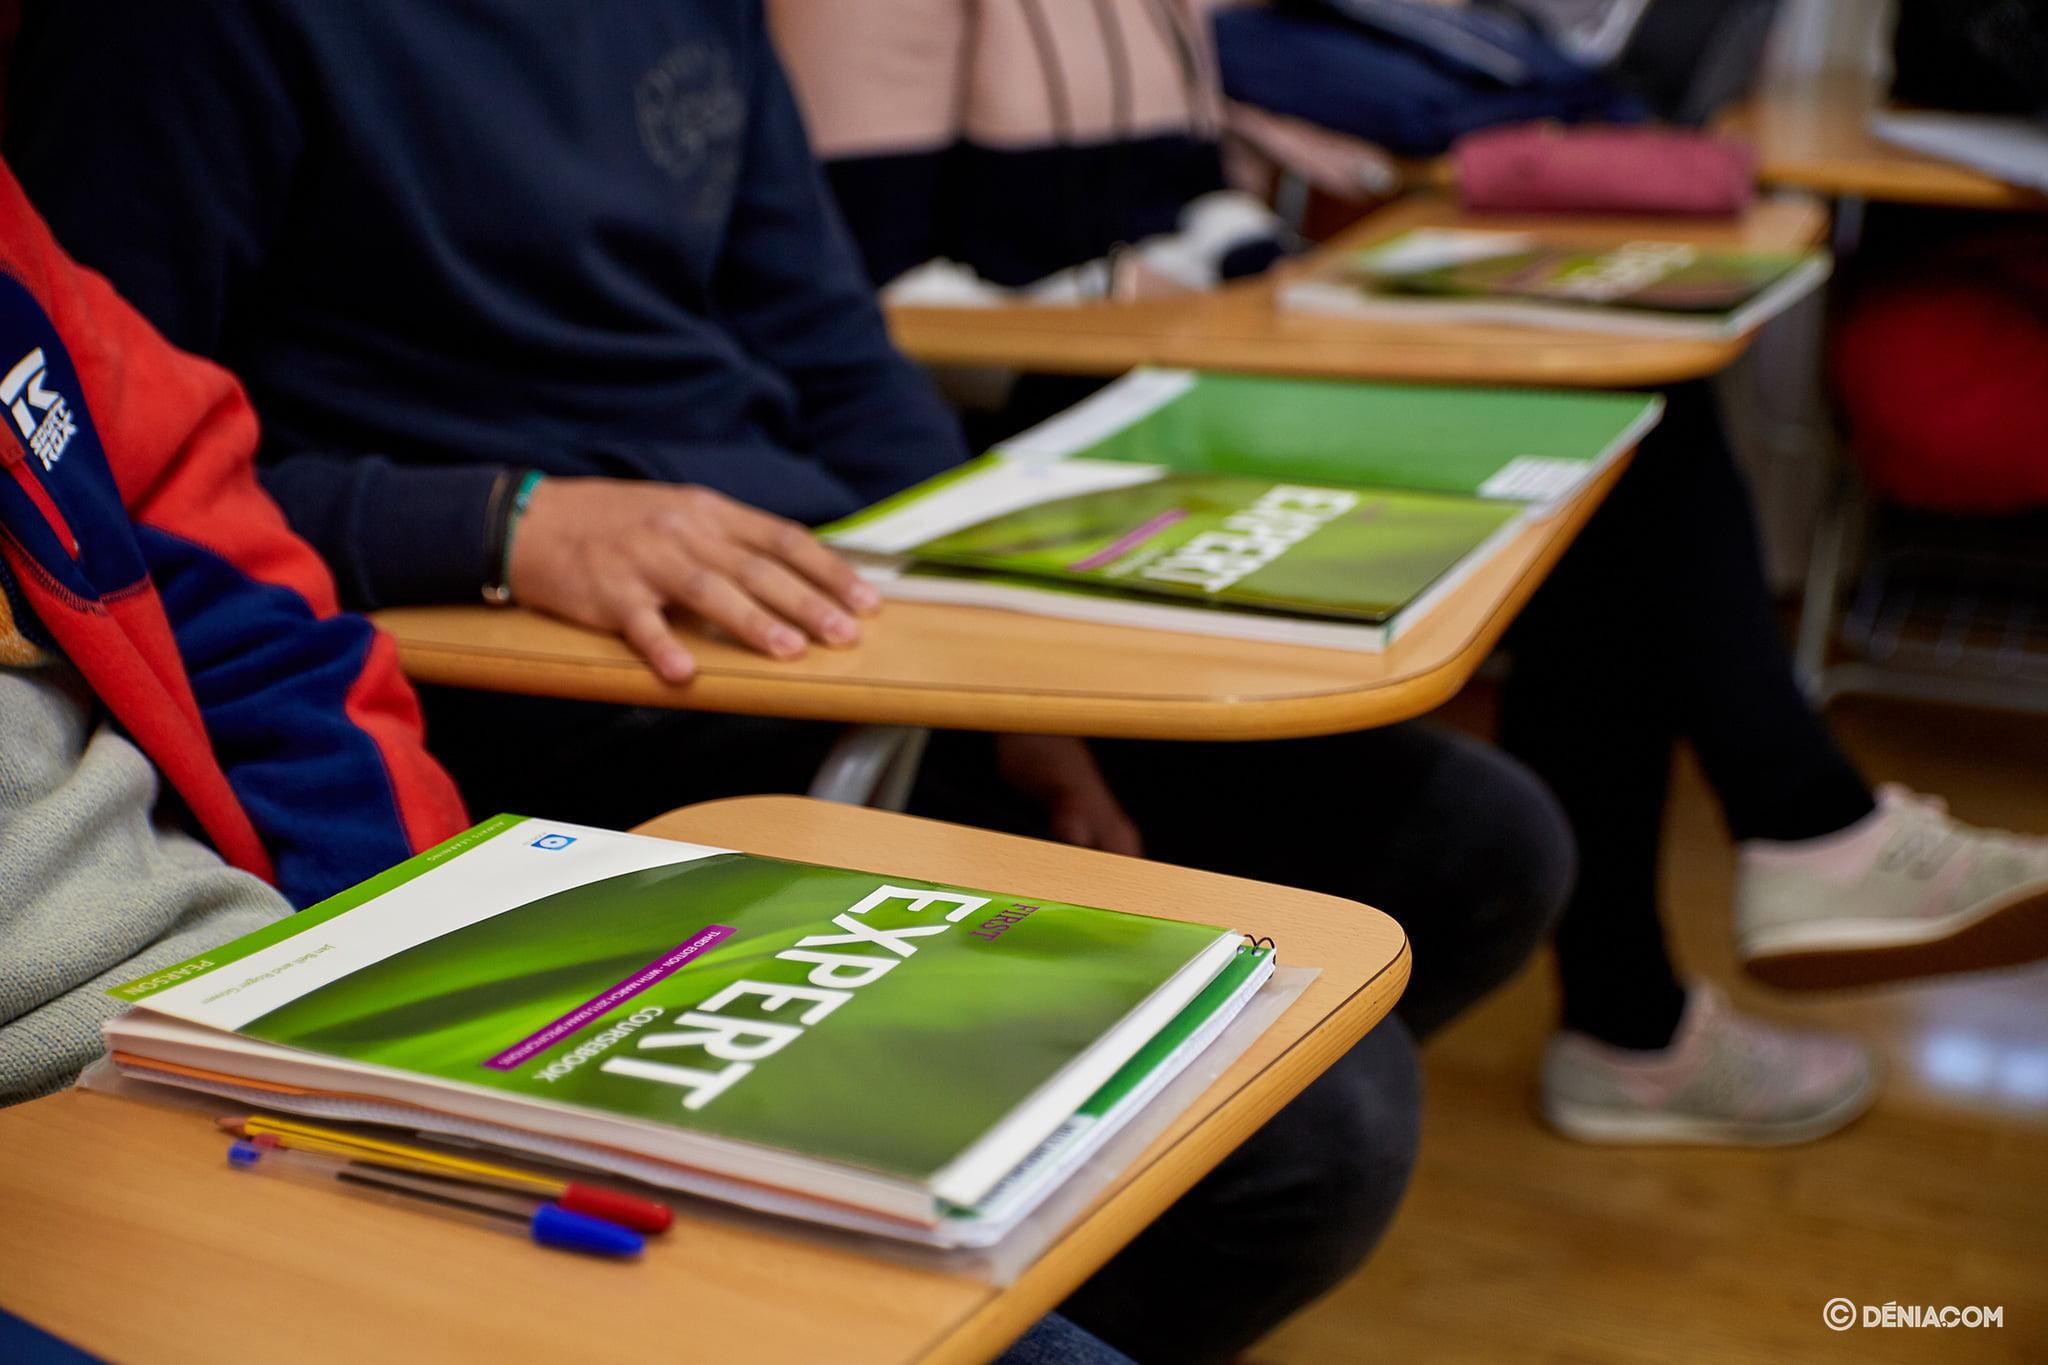 Prepara exámenes inglés Dénia – The English Institute